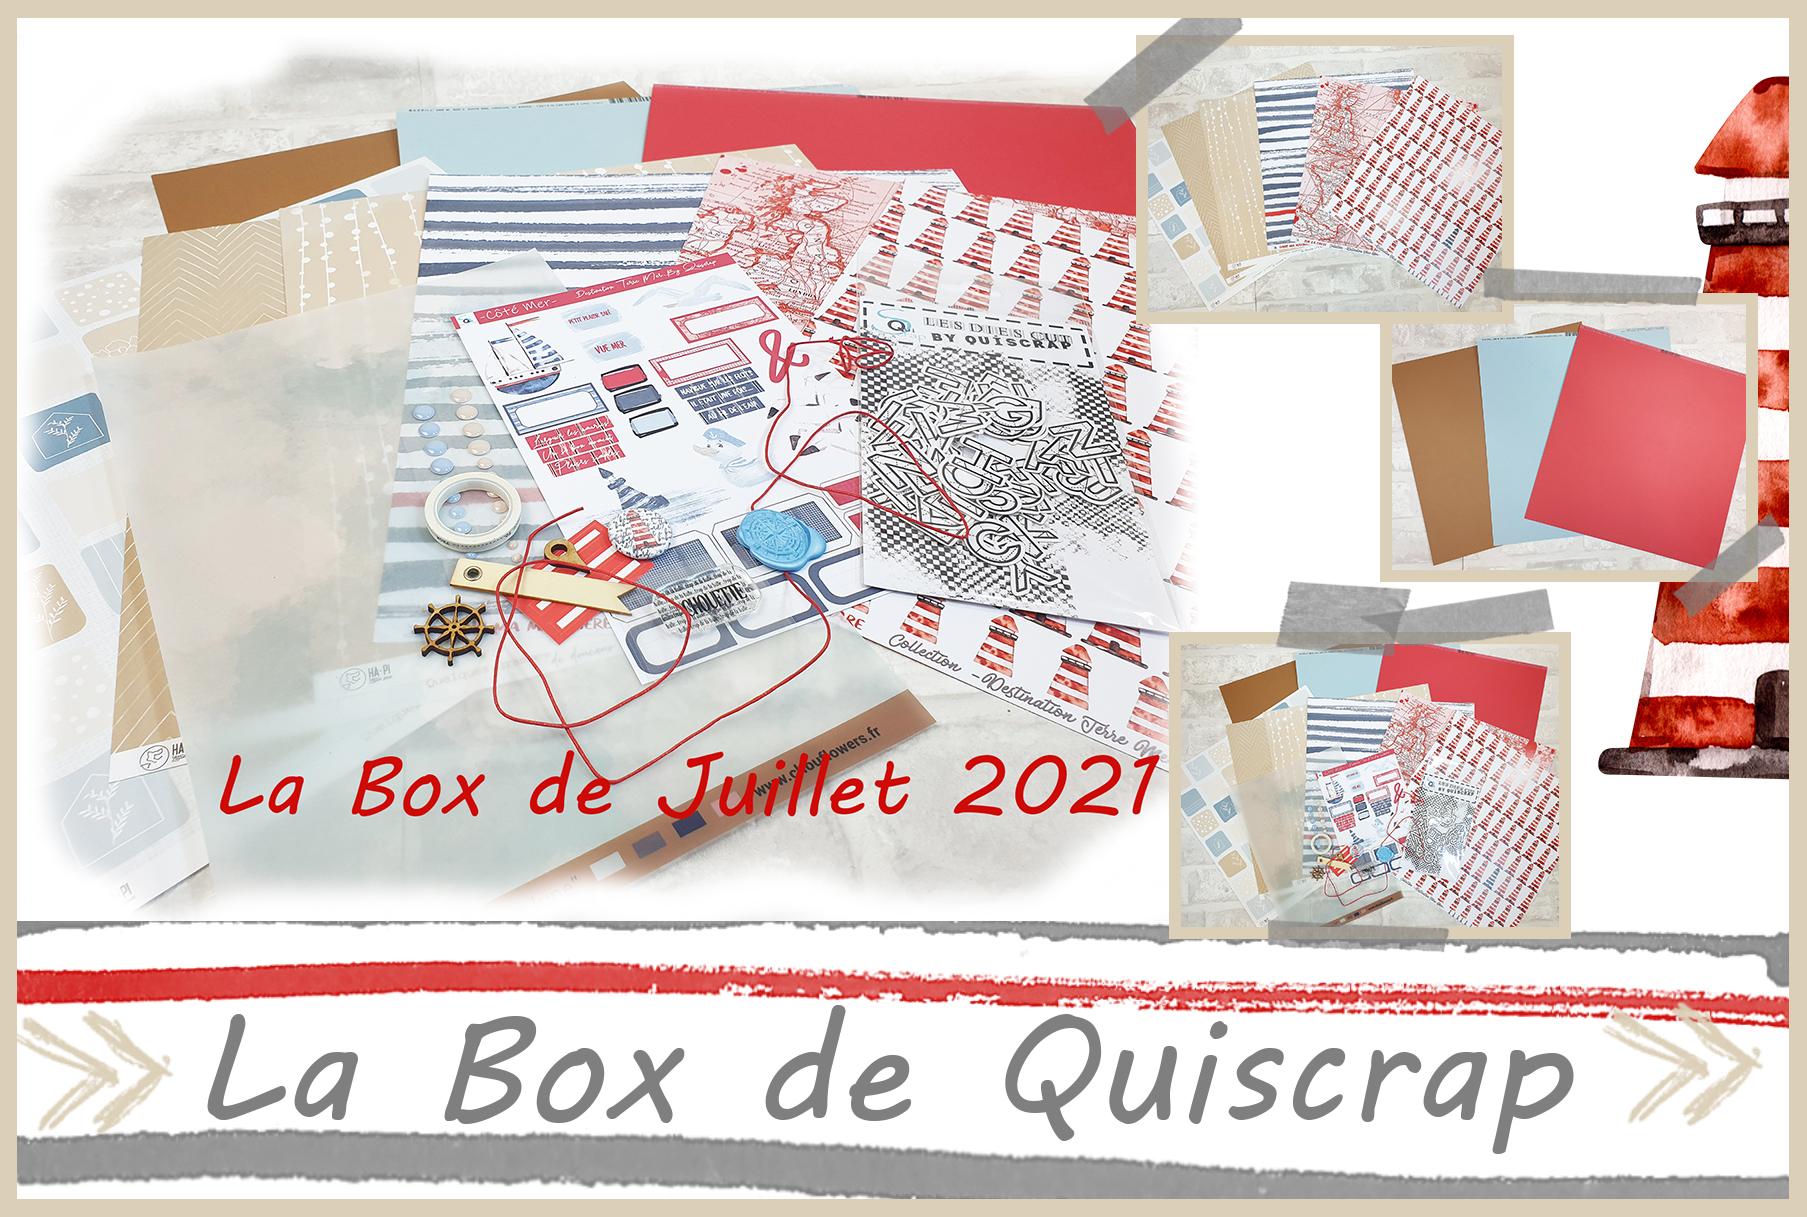 La Box de Juillet 2021